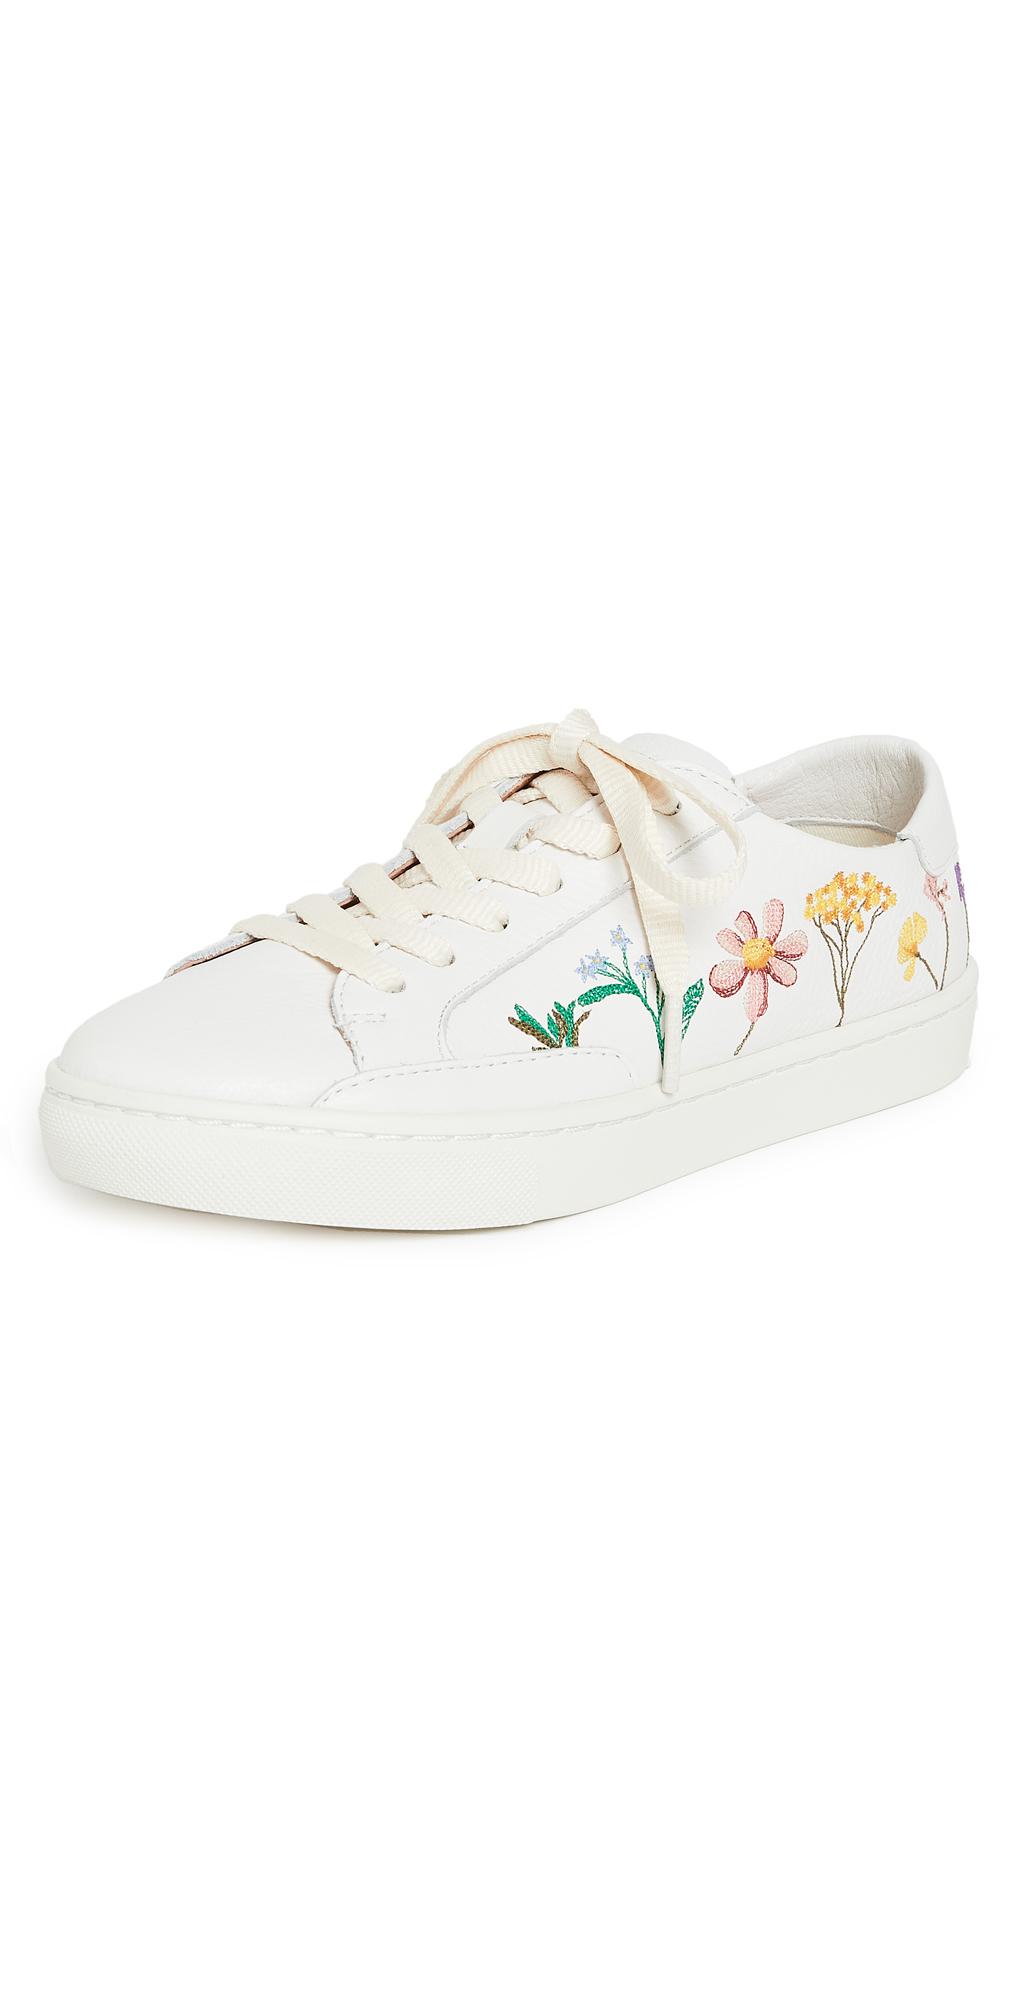 Soludos Pressed Flora Ibiza Sneakers